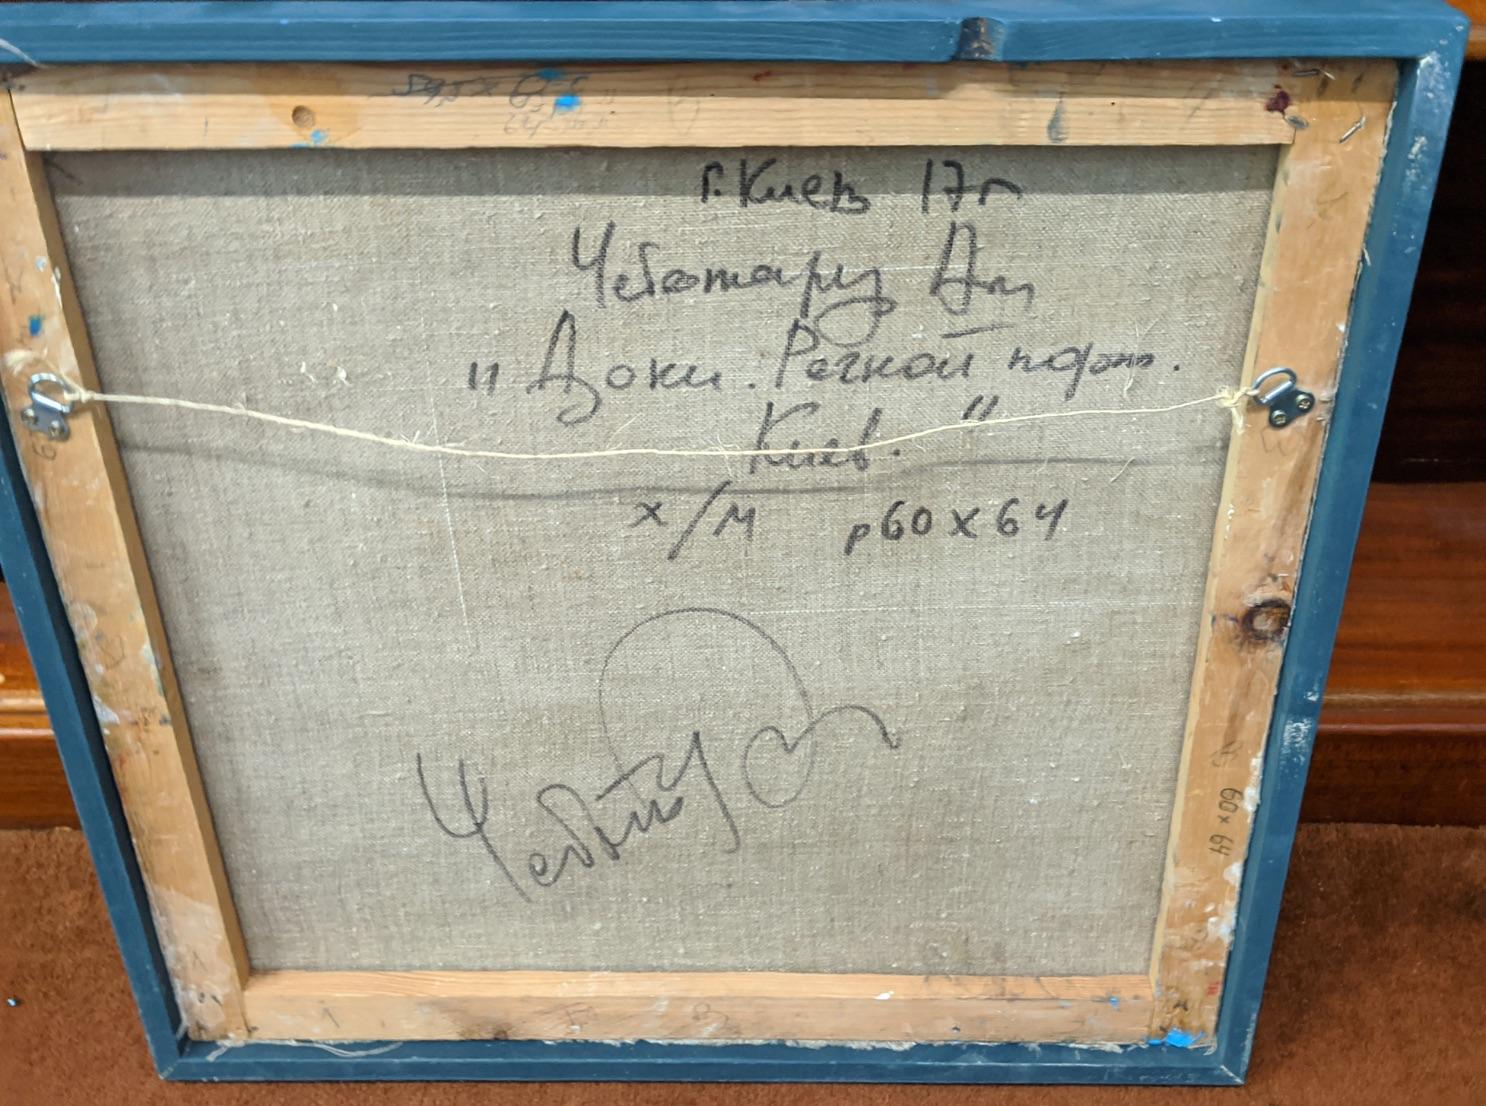 Andriy Chebotaru (b.1982, Ukrainian), Impressionist dockyard scene, oil on canvas, signed in pen - Image 3 of 3